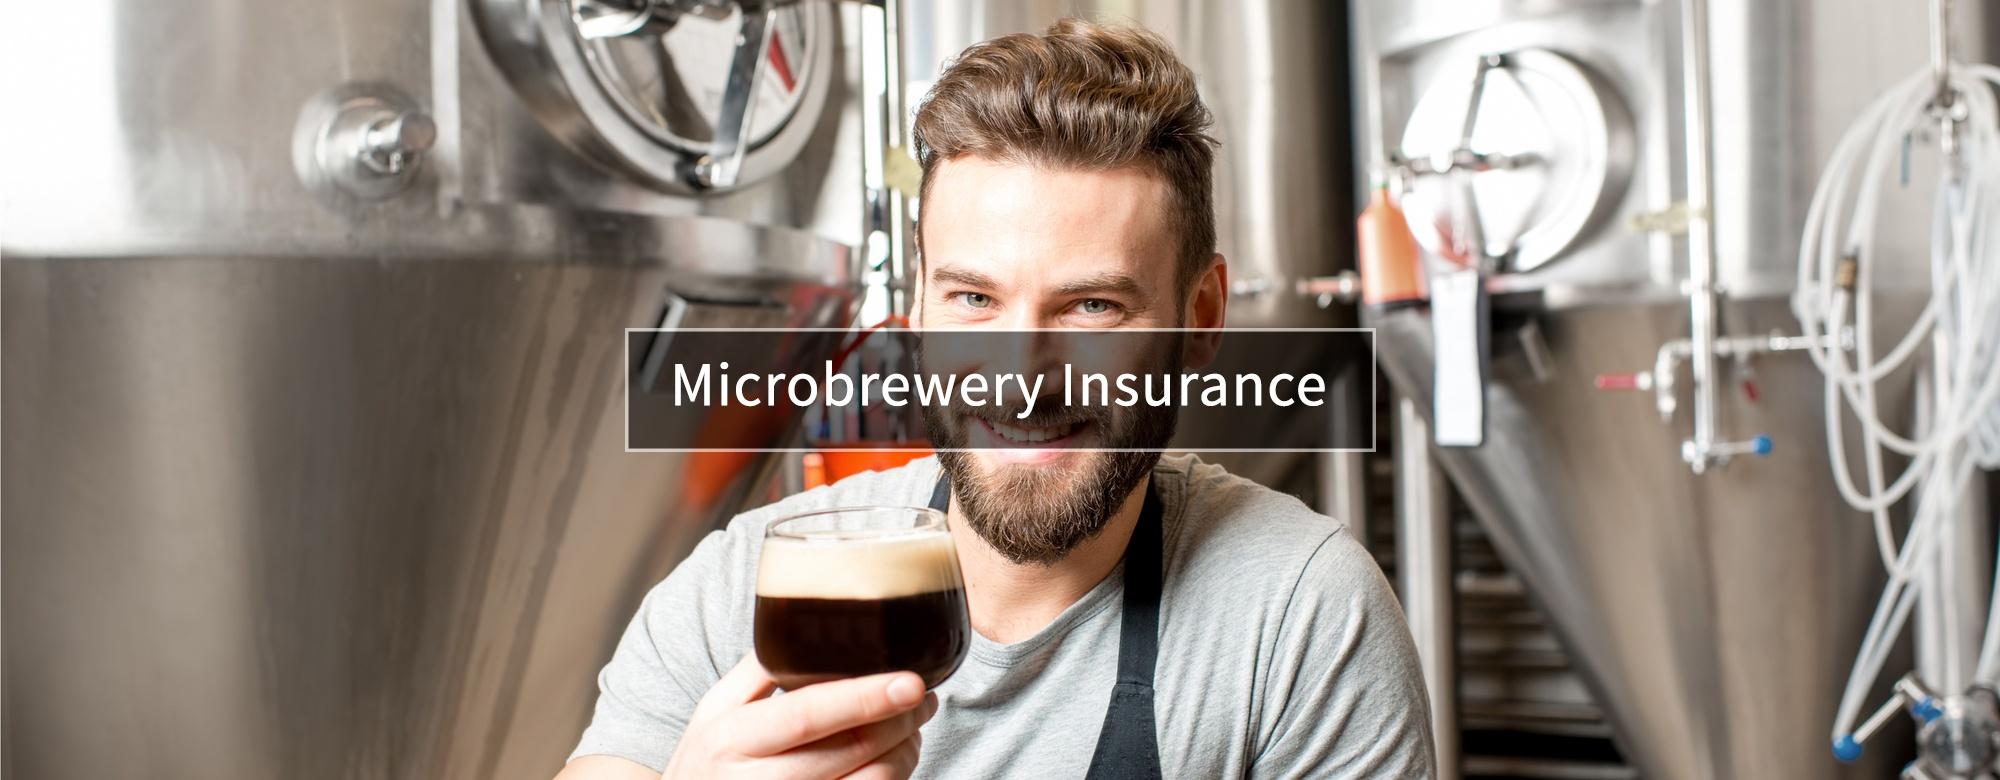 Microbrewery Insurance Massachusetts